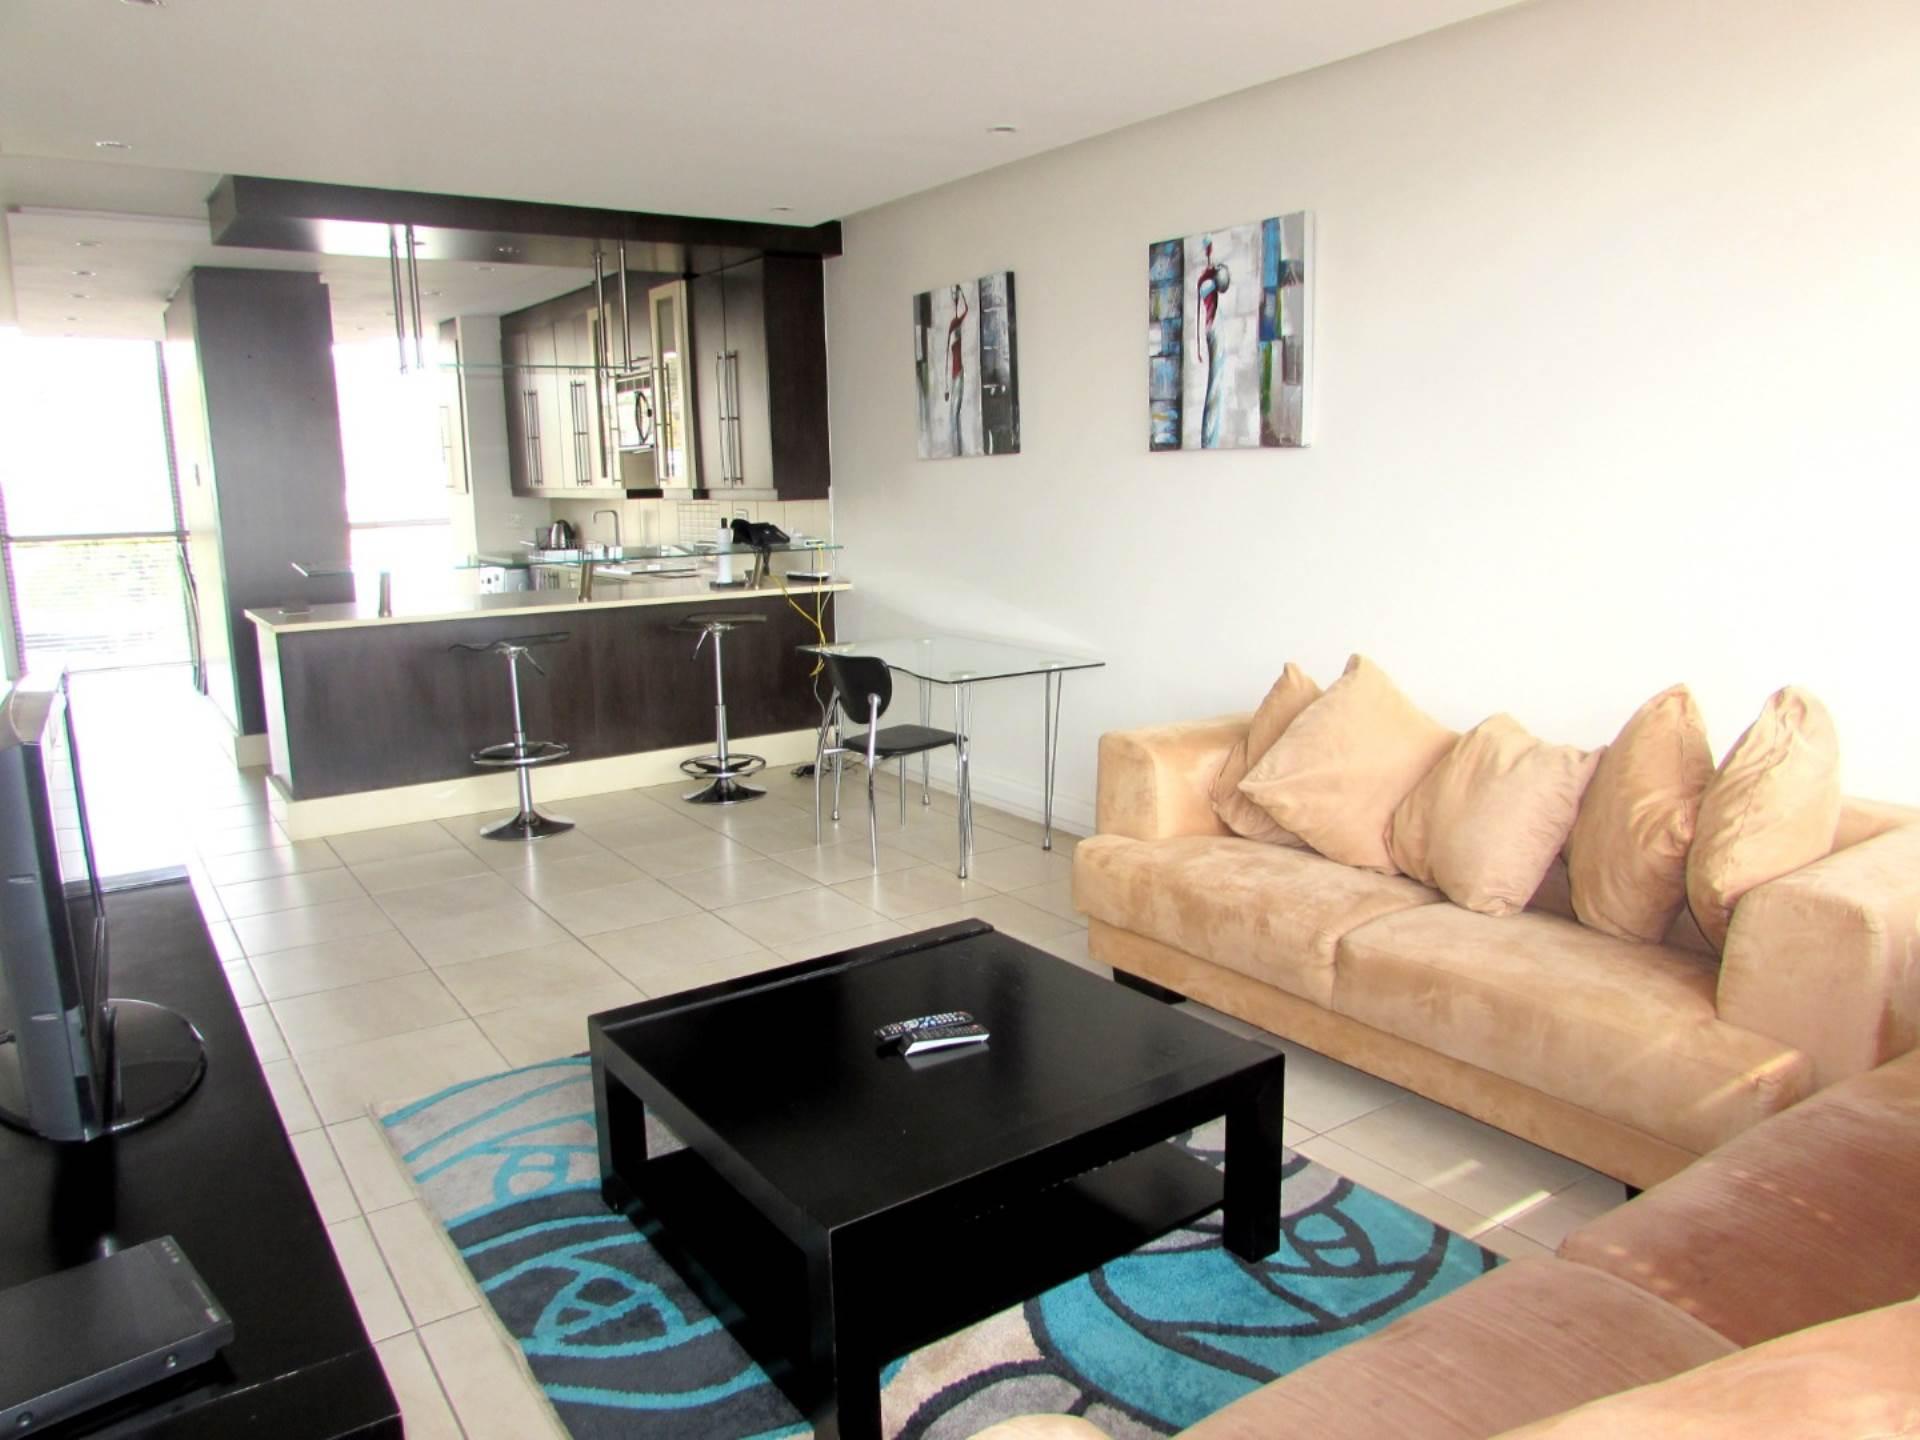 2 BedroomApartment For Sale In Bedford Gardens